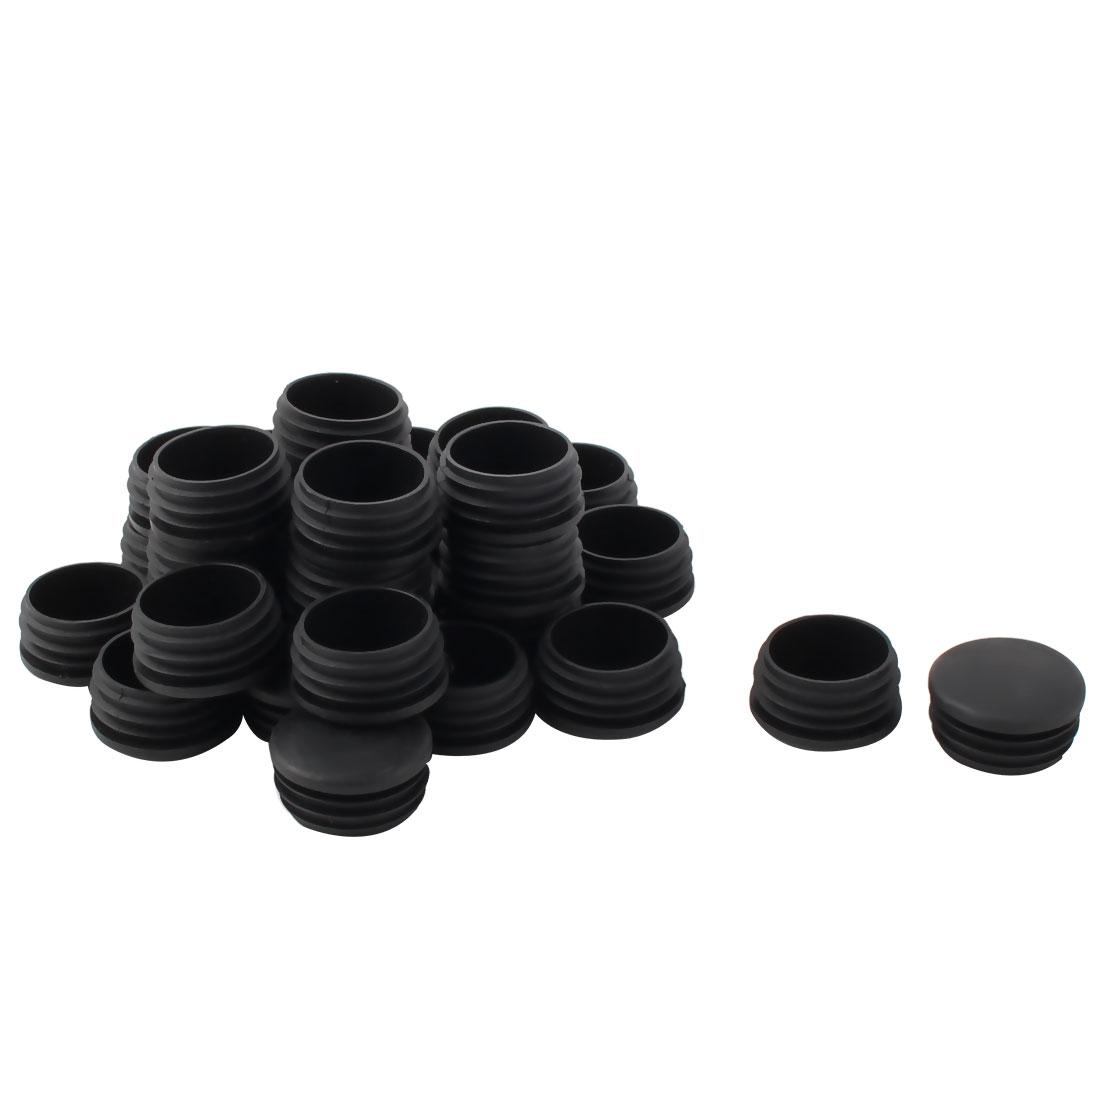 Plastic Round Tube Insert Blanking End Protectors Caps Black 37mm Dia 30 PCS